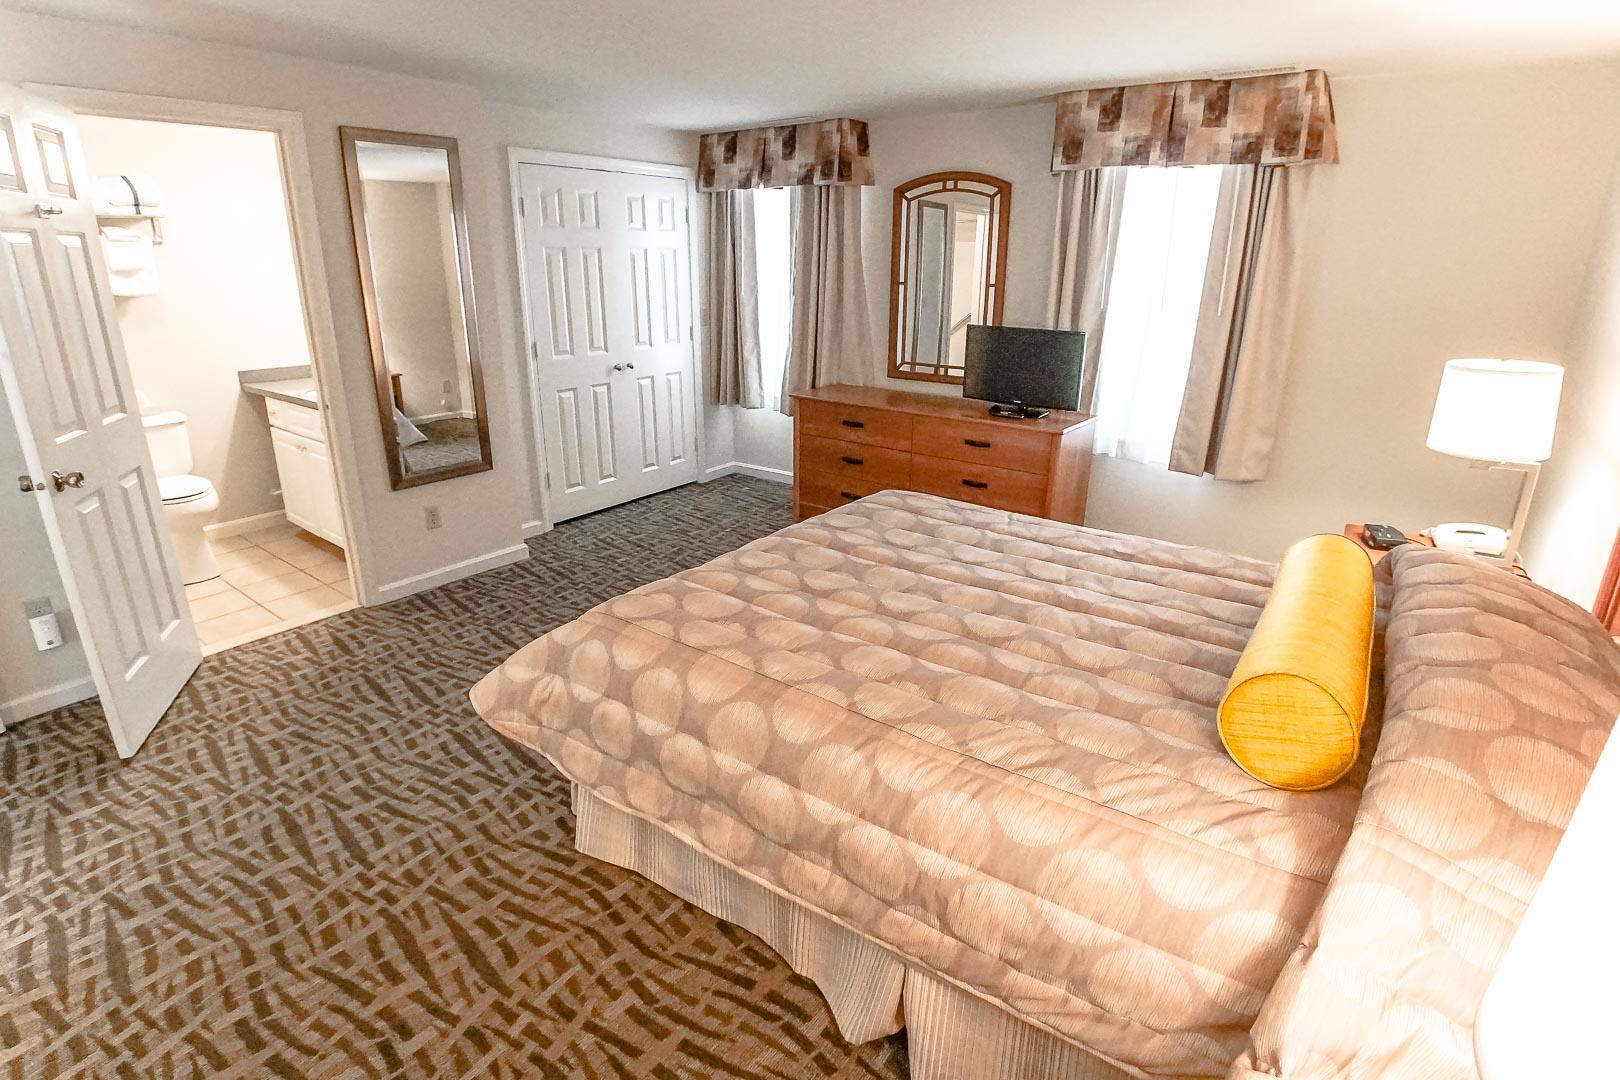 A charming master bedroom at VRI's Sea Mist Resort in Massachusetts.